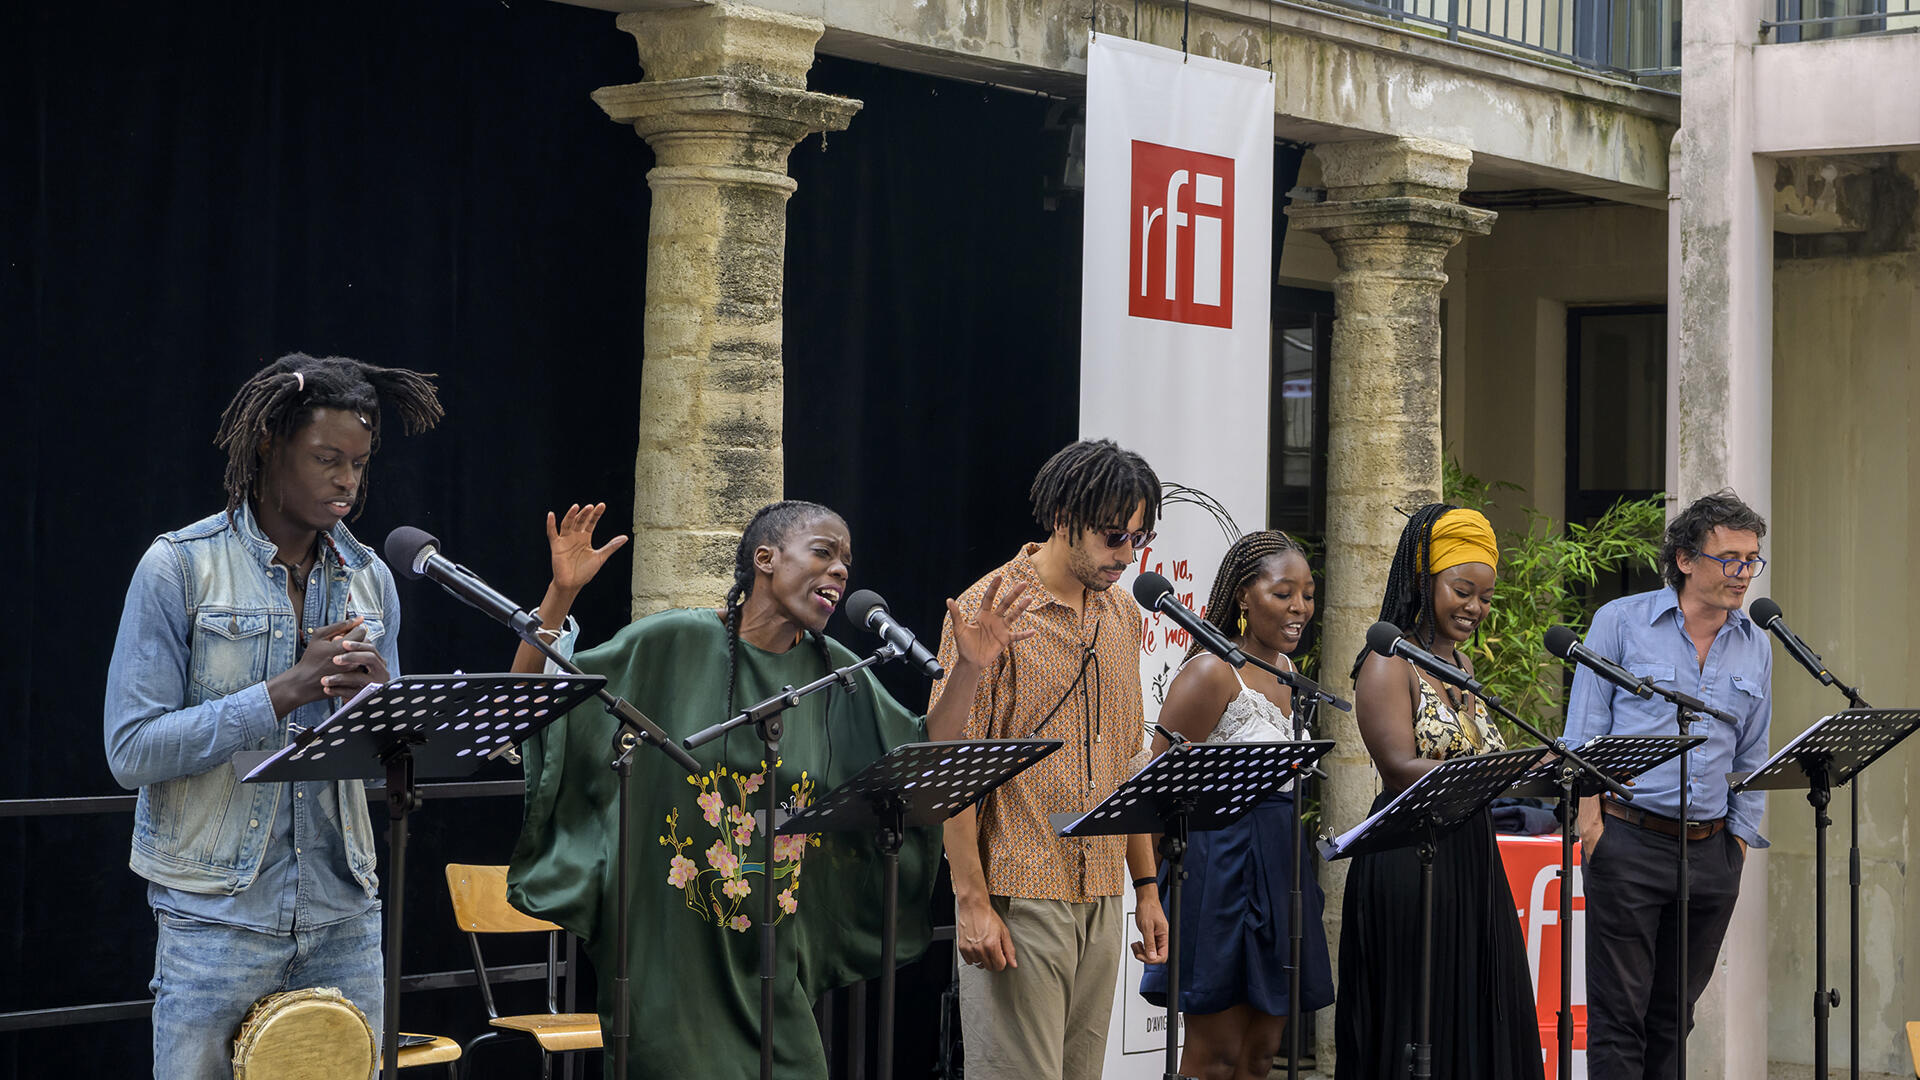 Ça va ça va le monde_Nuit de veille_001_ Ibrahima Diokine Sambou, Sophie Senecaut, Tom Adjibi, Aminata Abdoulaye, Babetida Sadjo, Vincent Minne